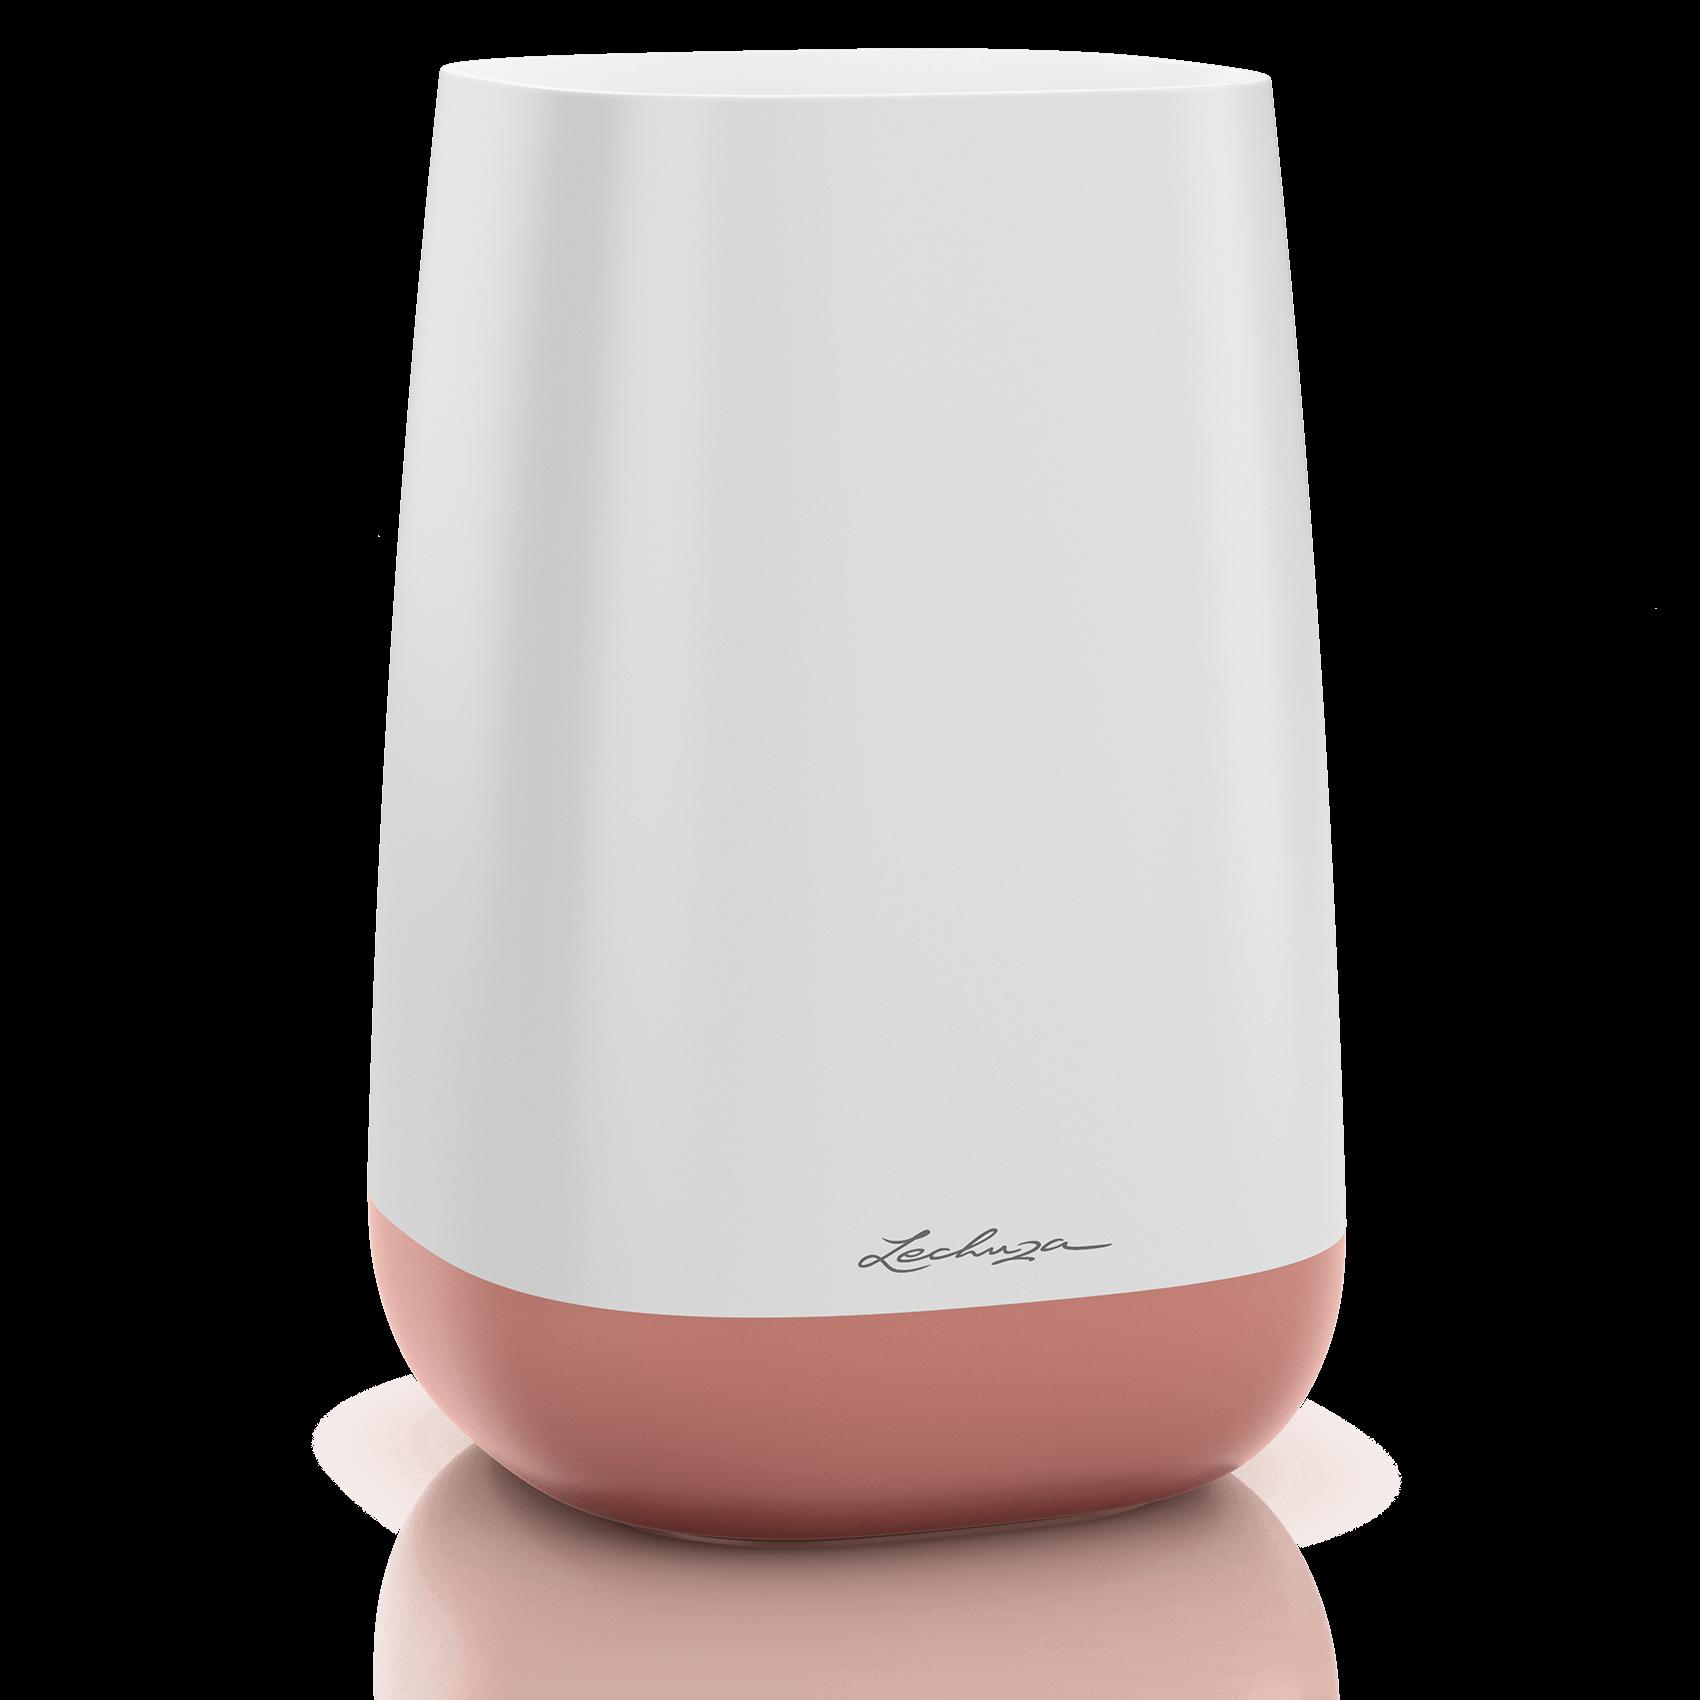 Ваза YULA белый/ярко-розовый